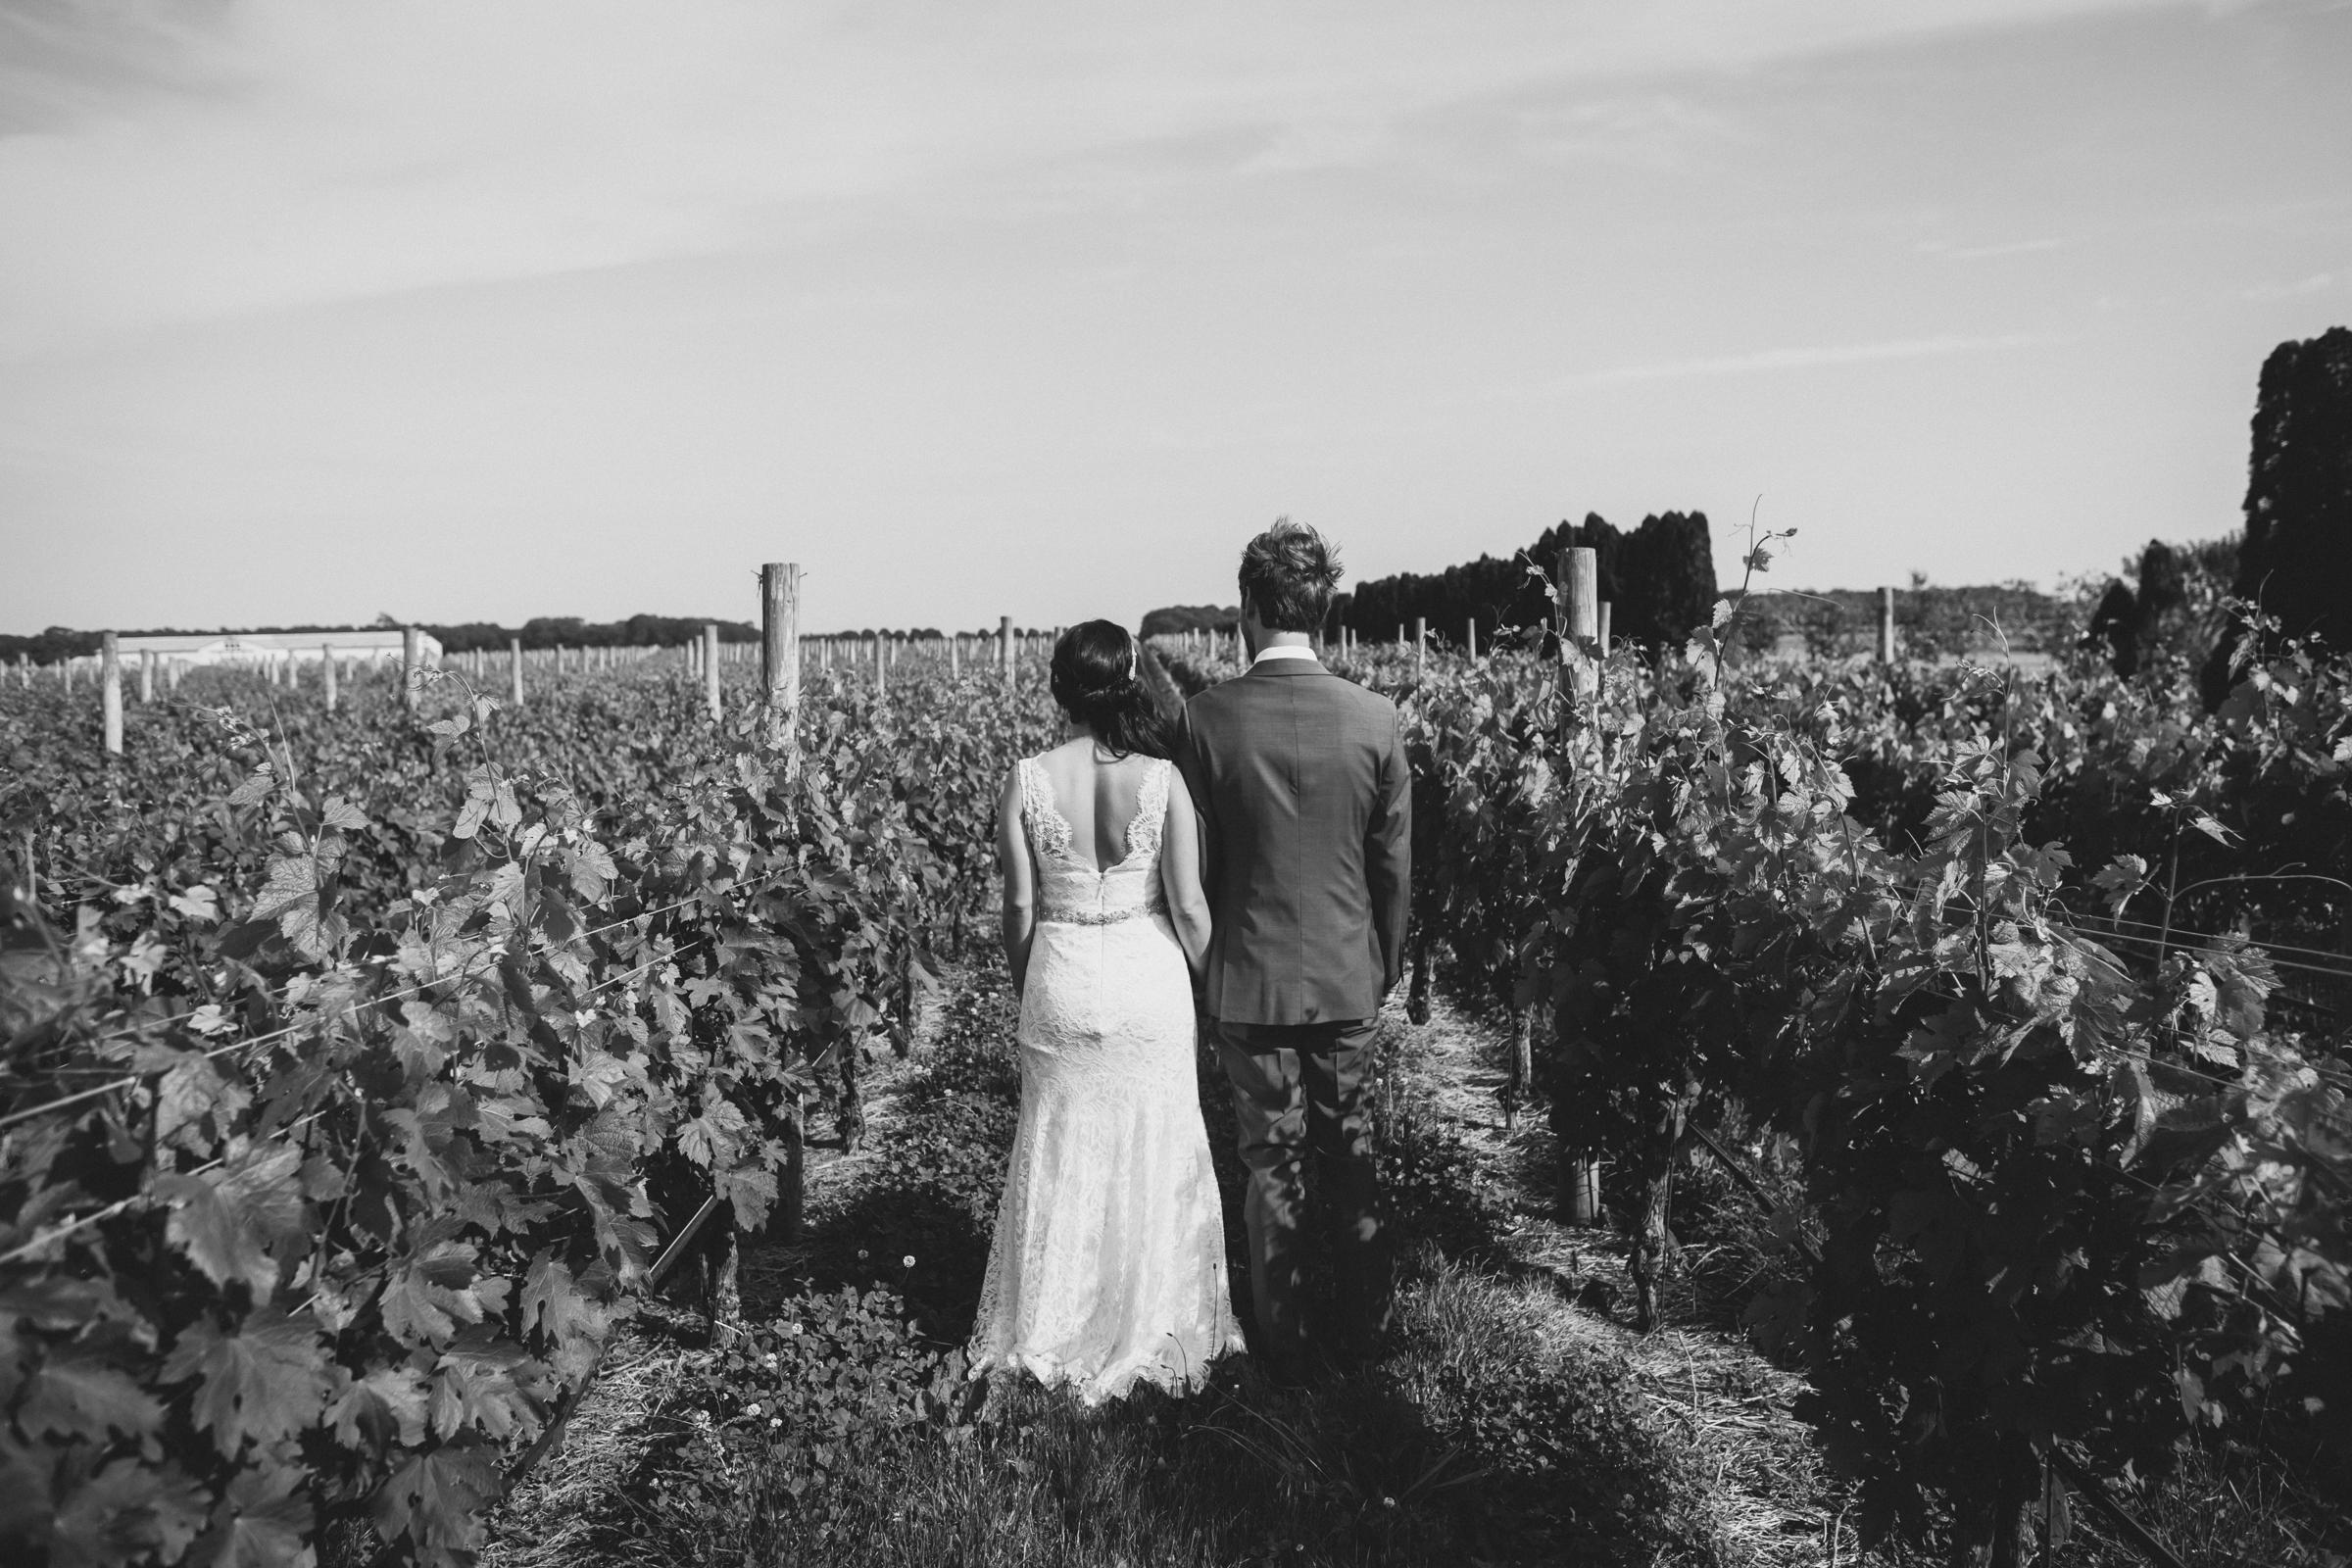 Martha-Clara-Vineyard-Long-Island-Documentary-Wedding-Photographer-33.jpg